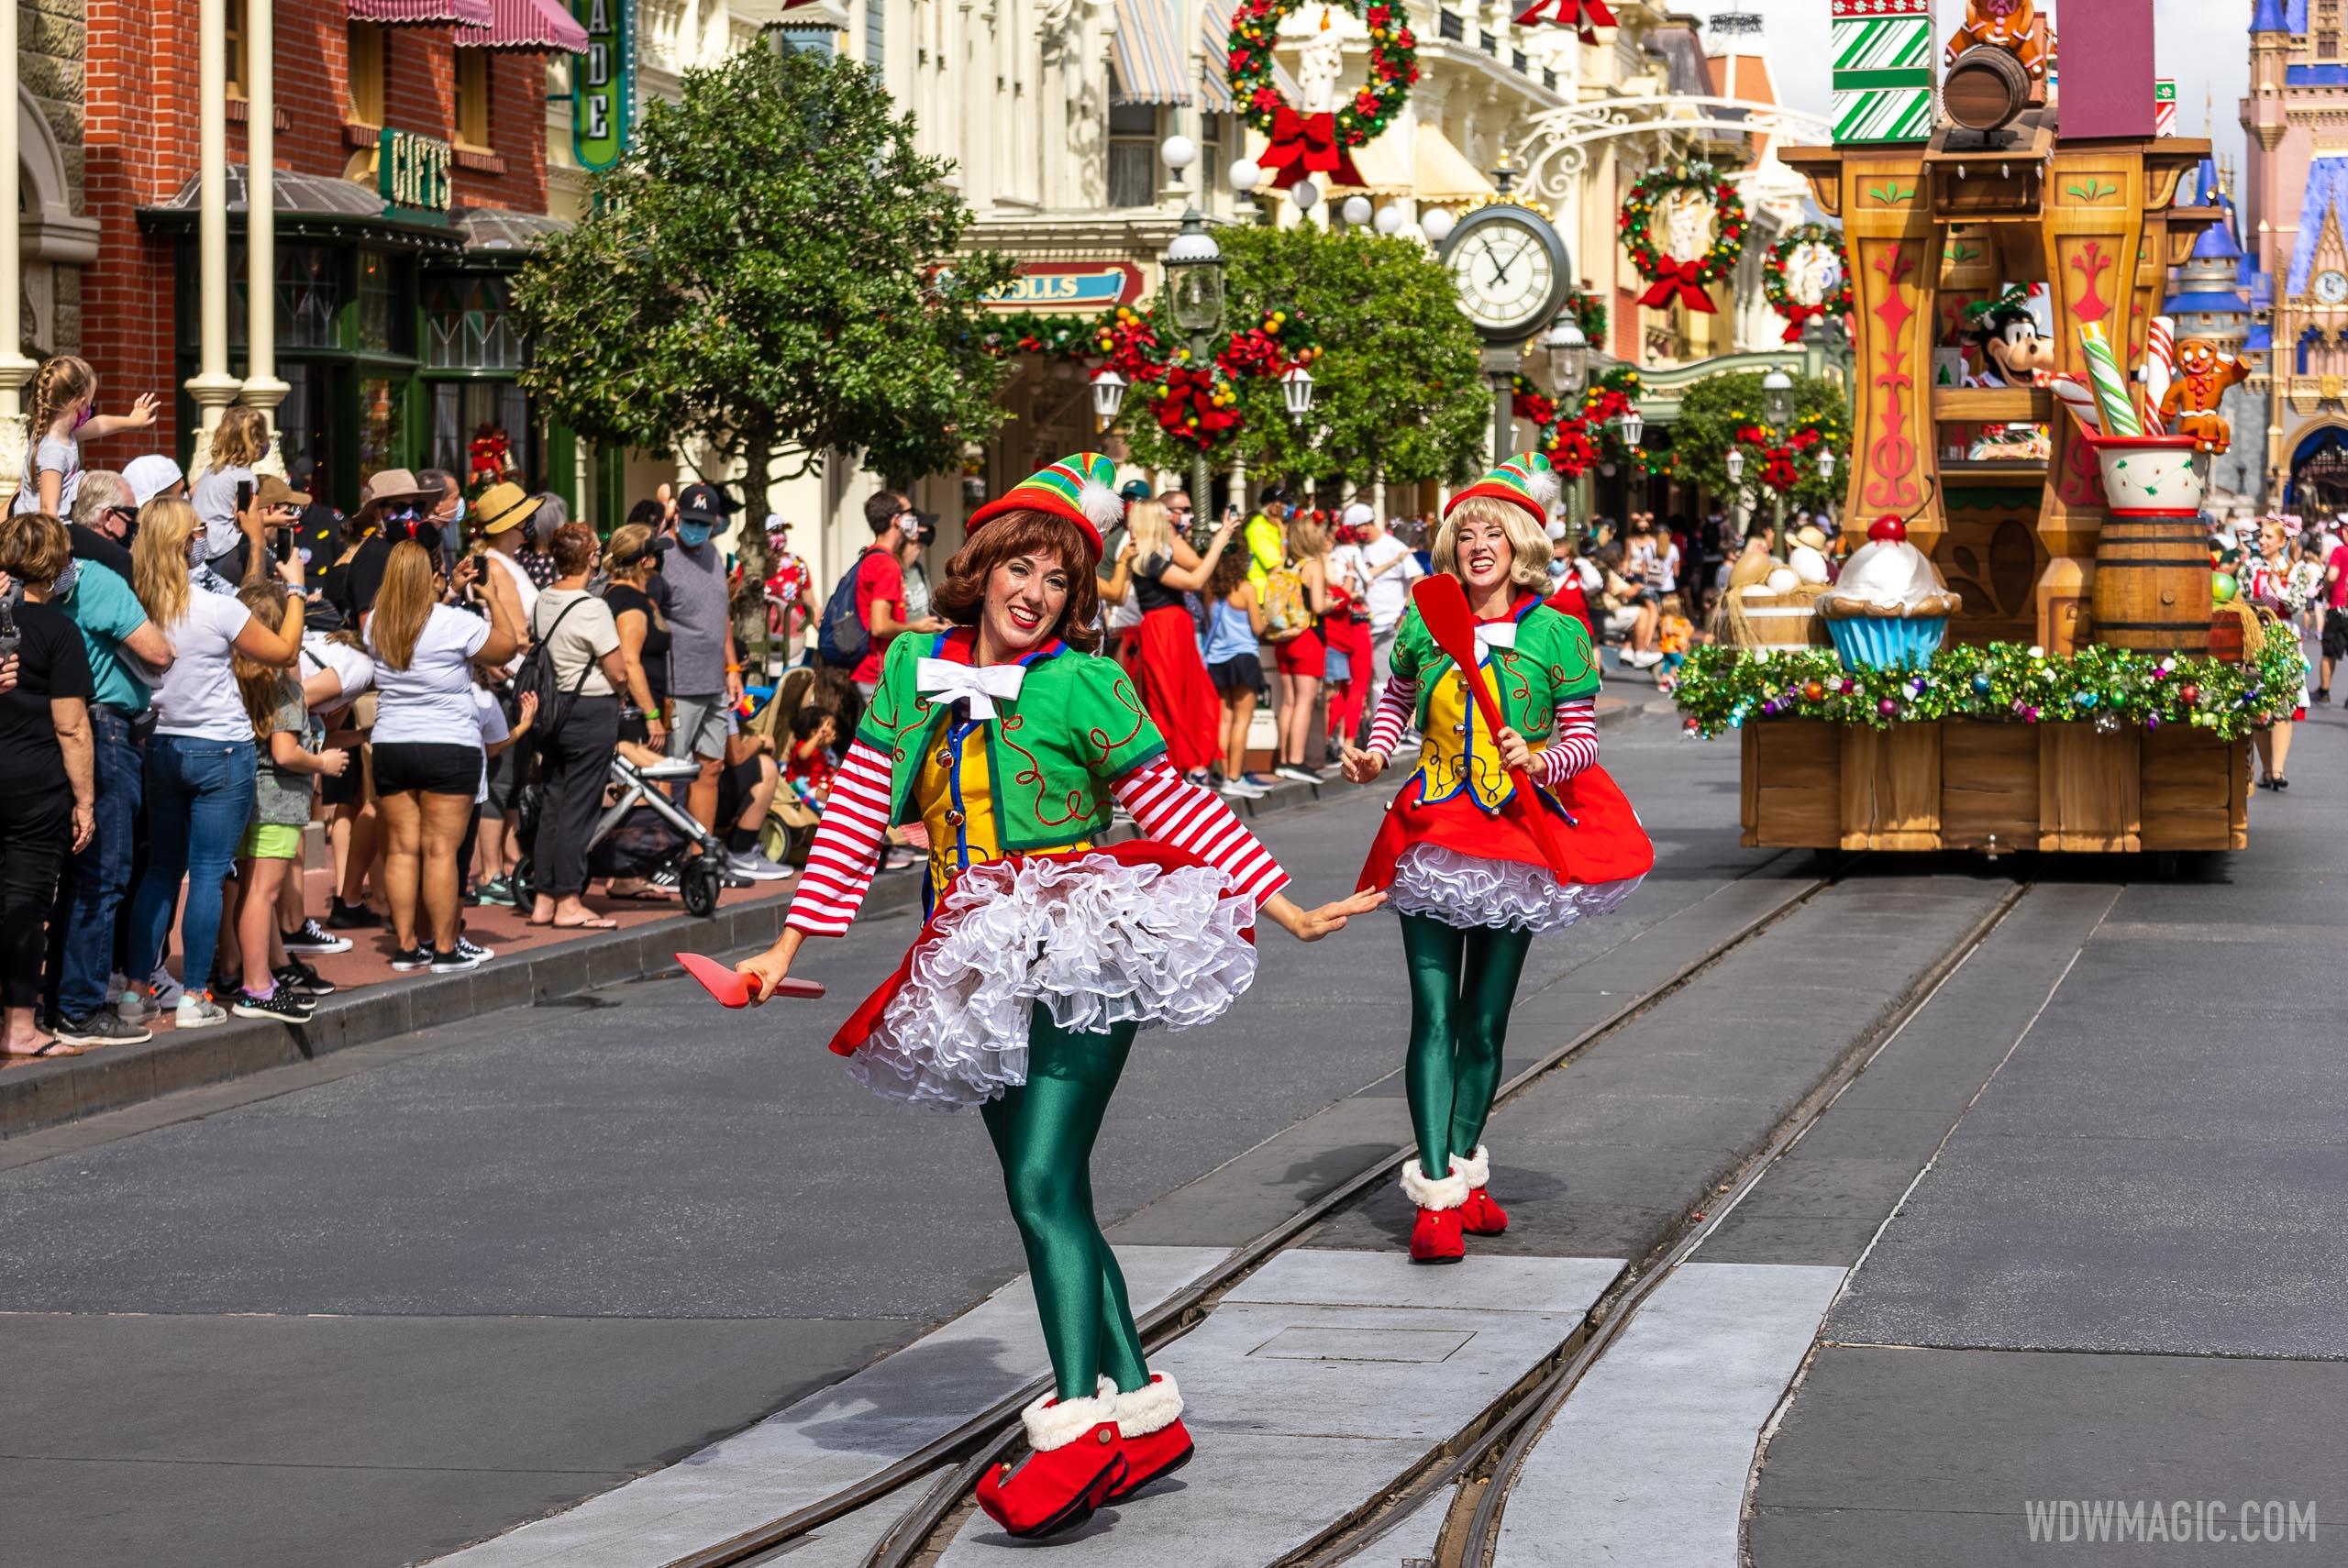 Holiday cavalcades and entertainment at the Magic Kingdom 2020